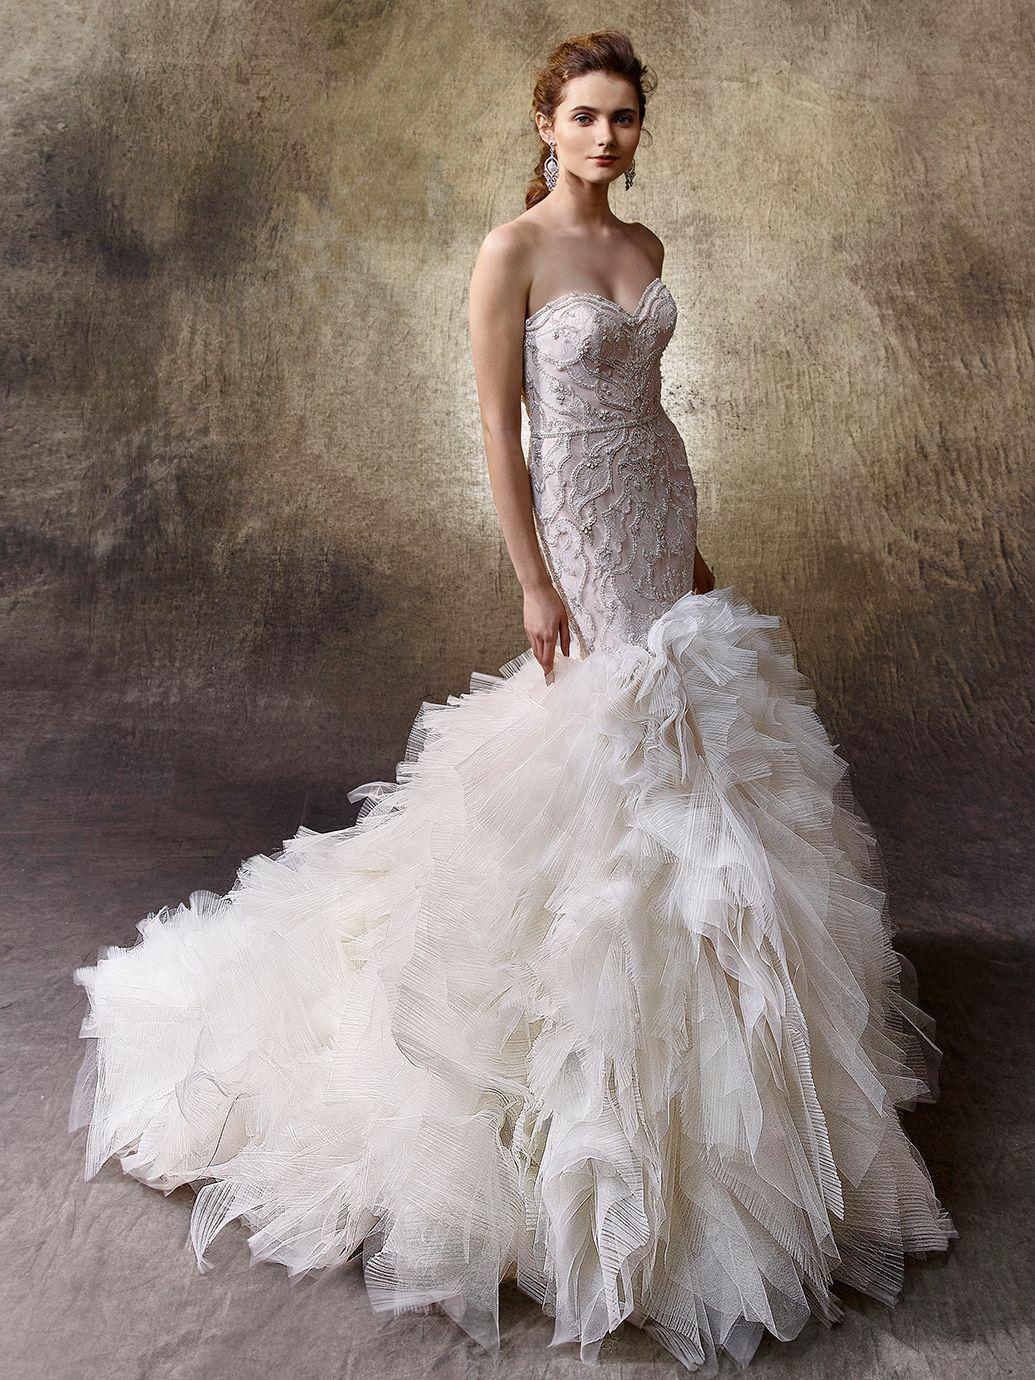 2017 enzoani lisa front view wedding dresses pinterest wedding dress out of enzoani lisa ombrellifo Images